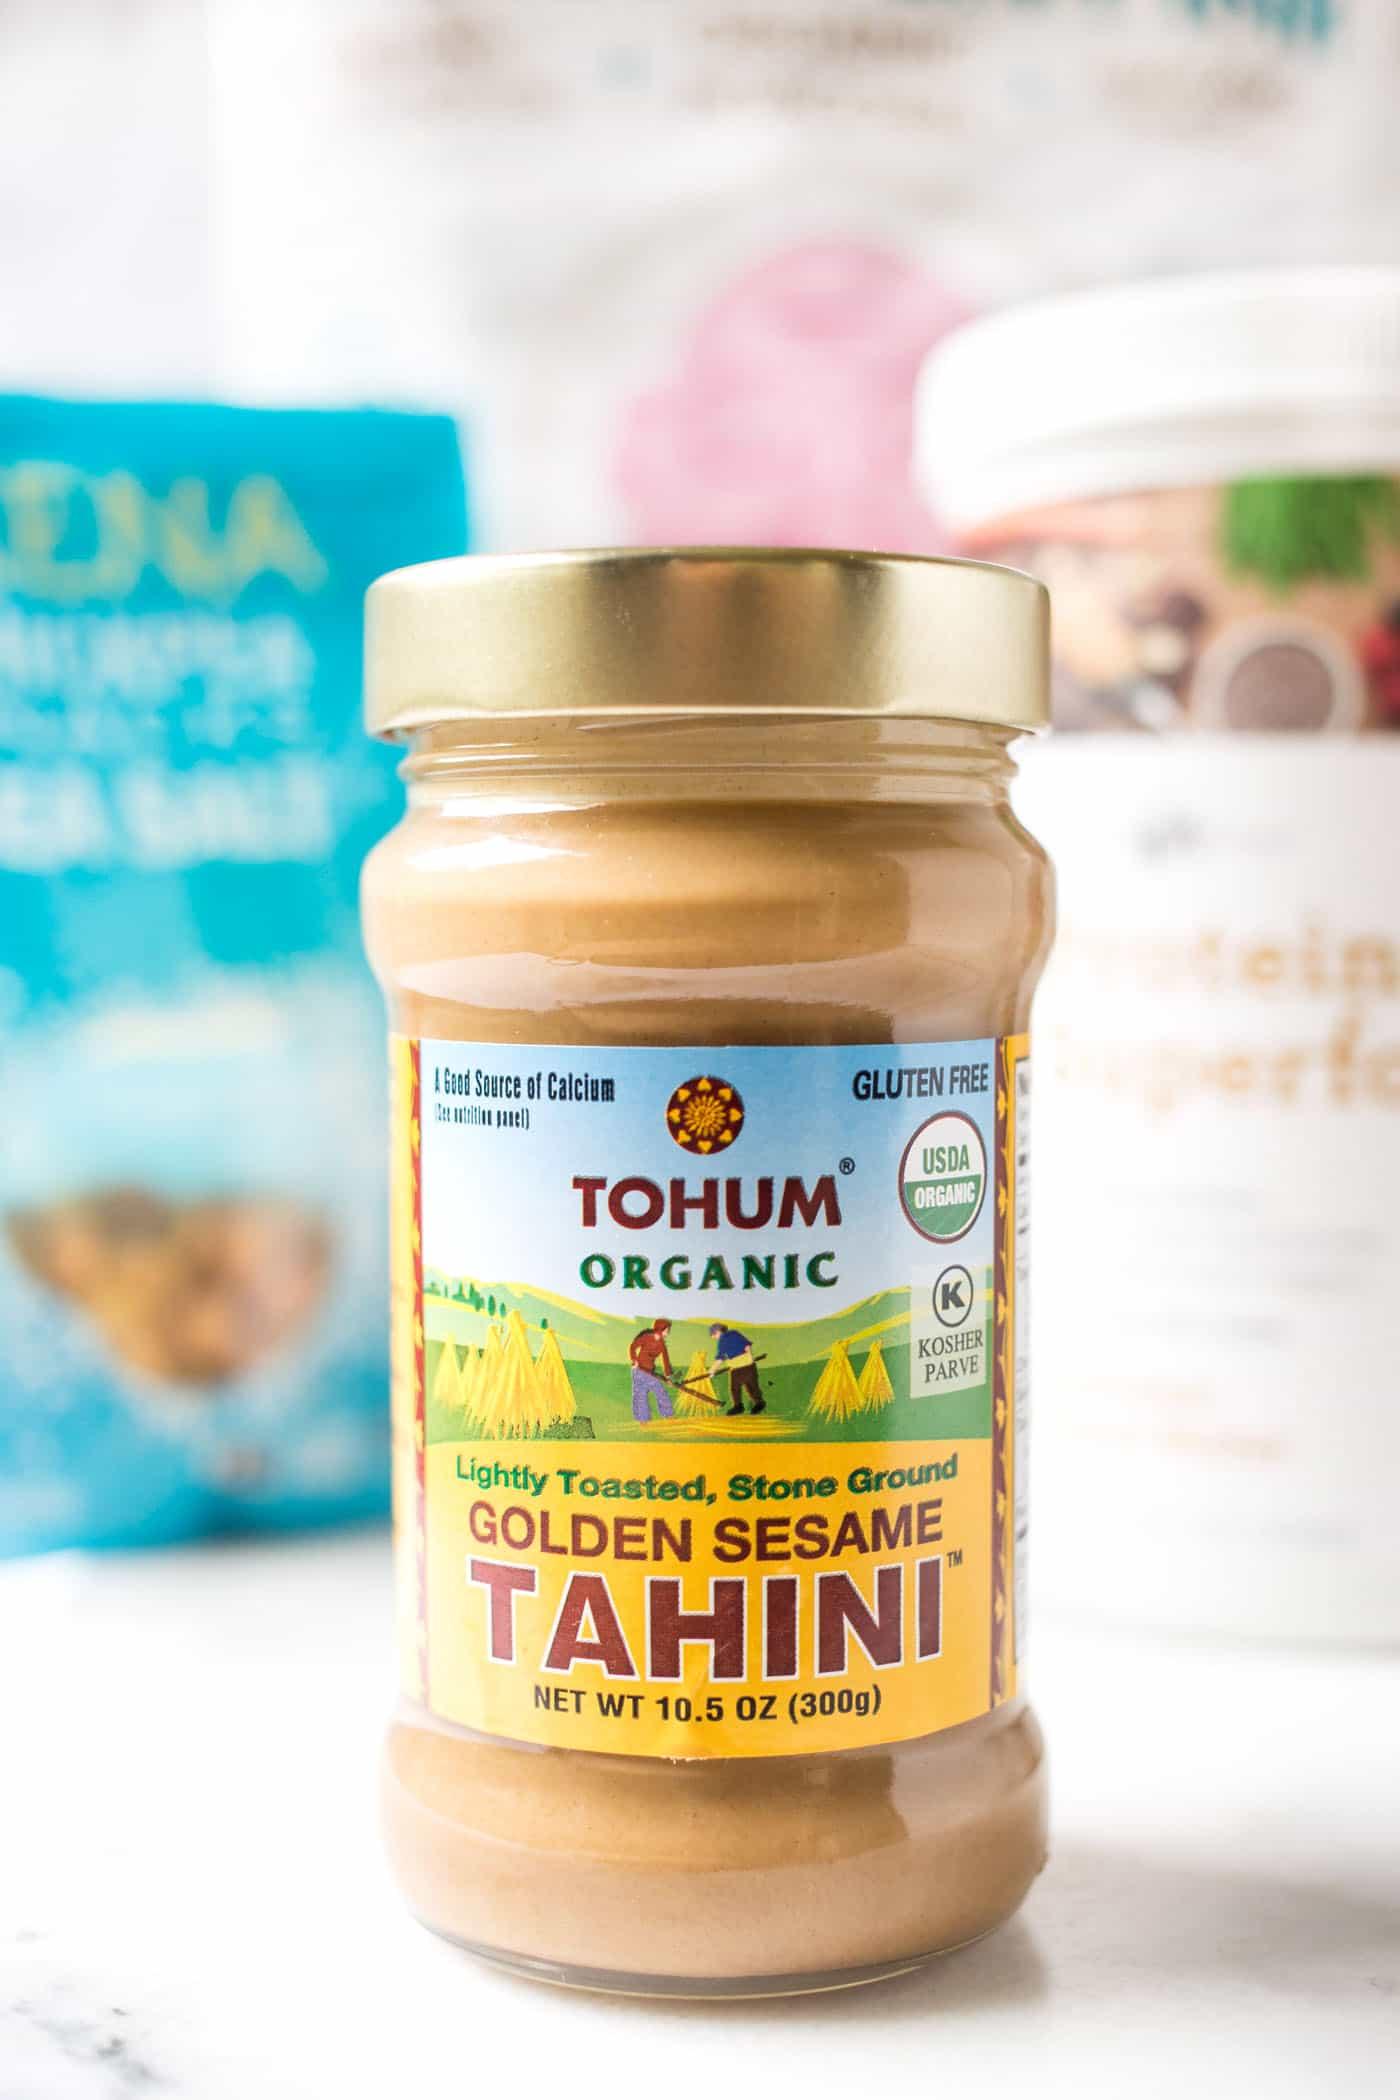 NEW tahini discovery!! Tahini made with golden sesame seeds!